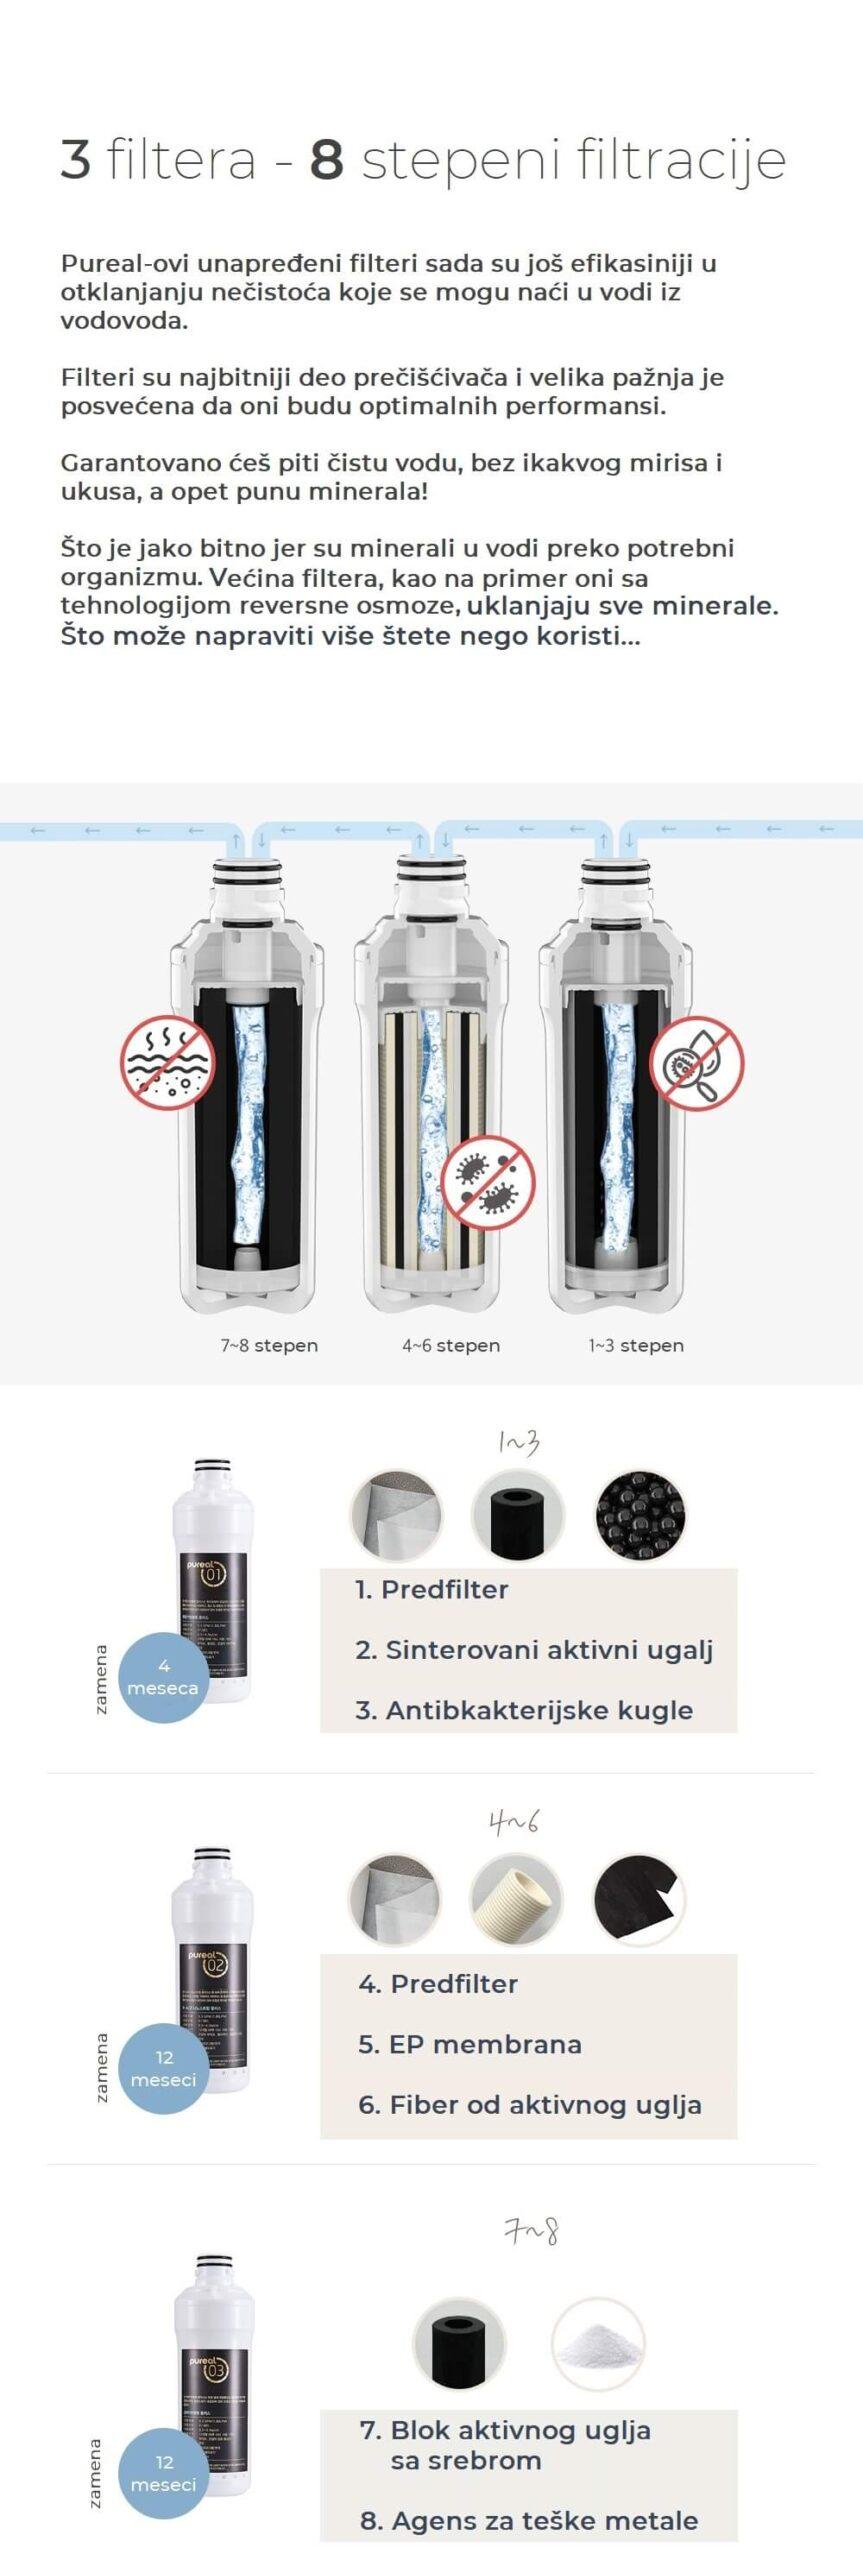 Pureal filteri 1 scaled